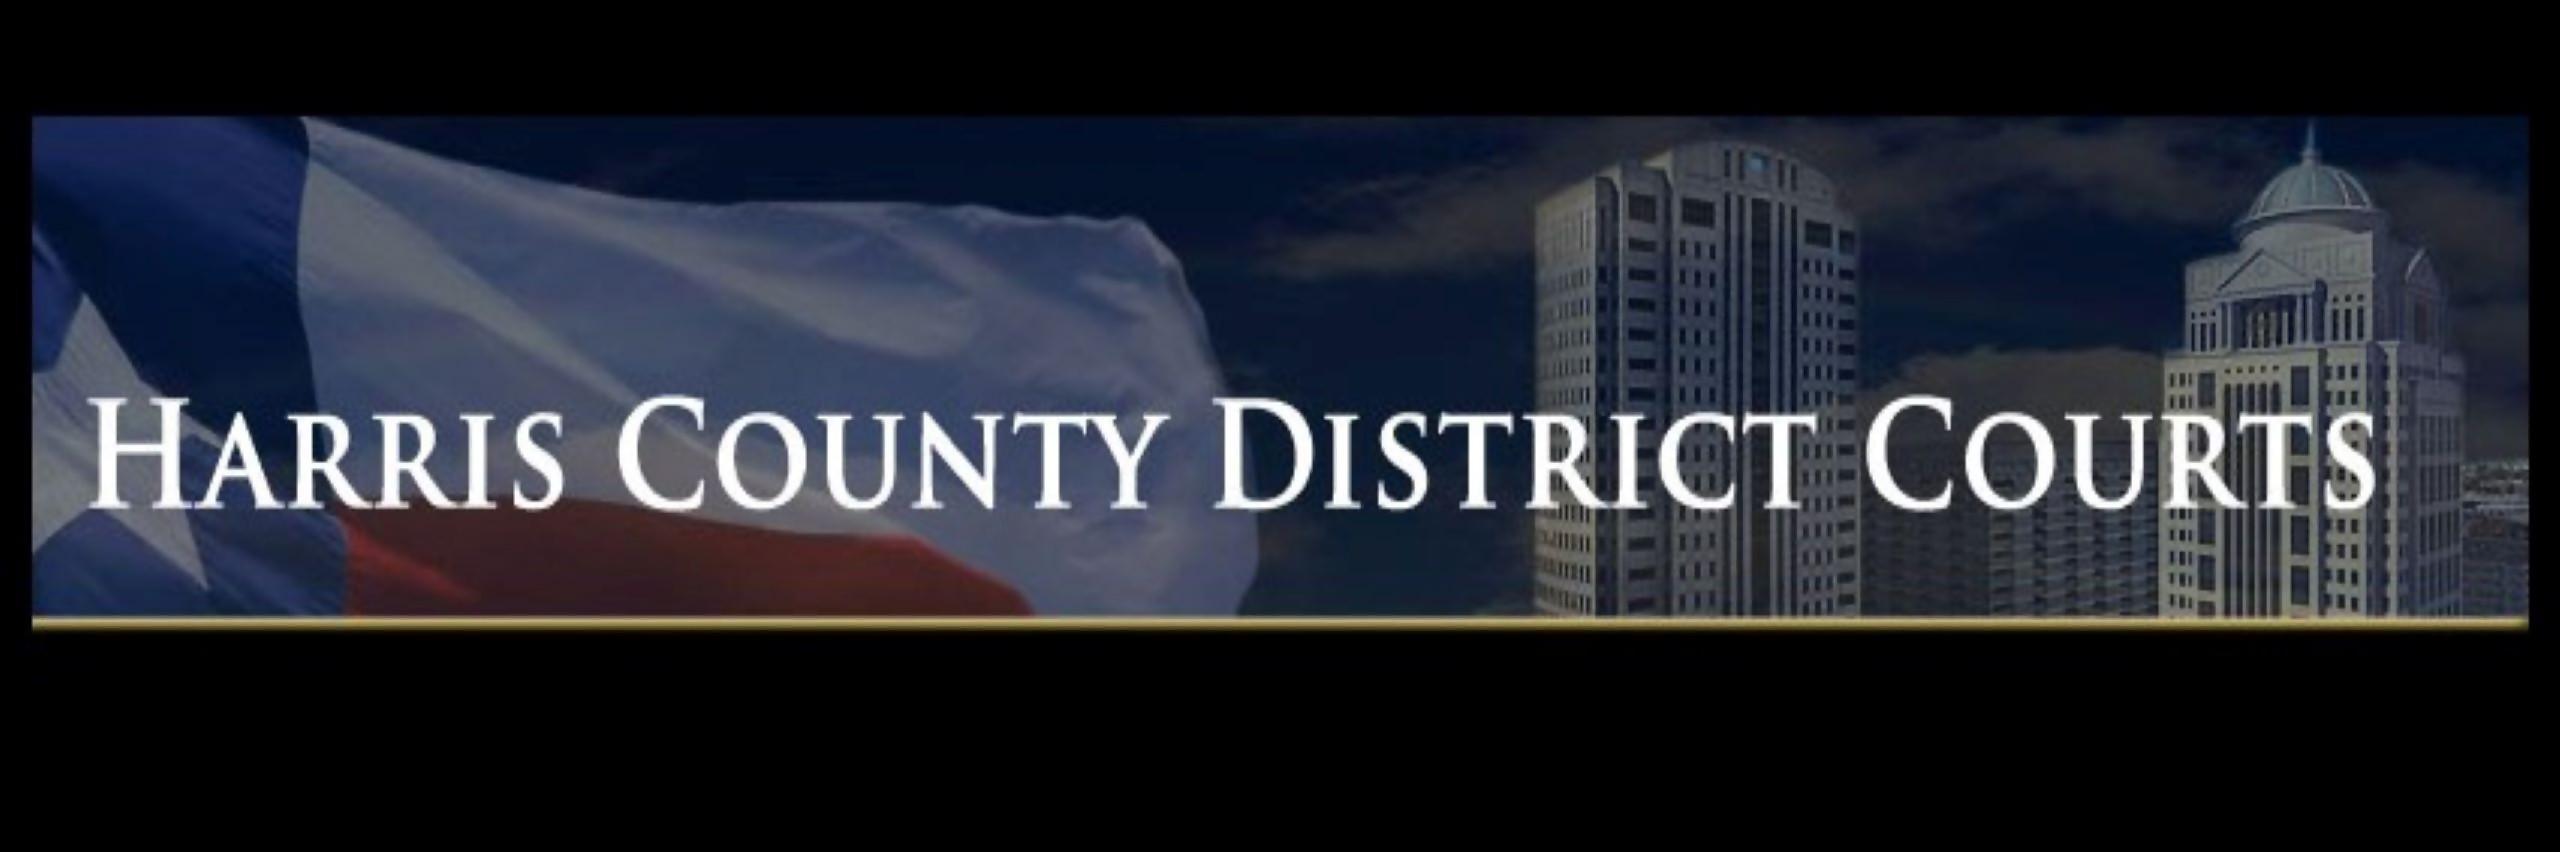 157th District Court - Live Stream